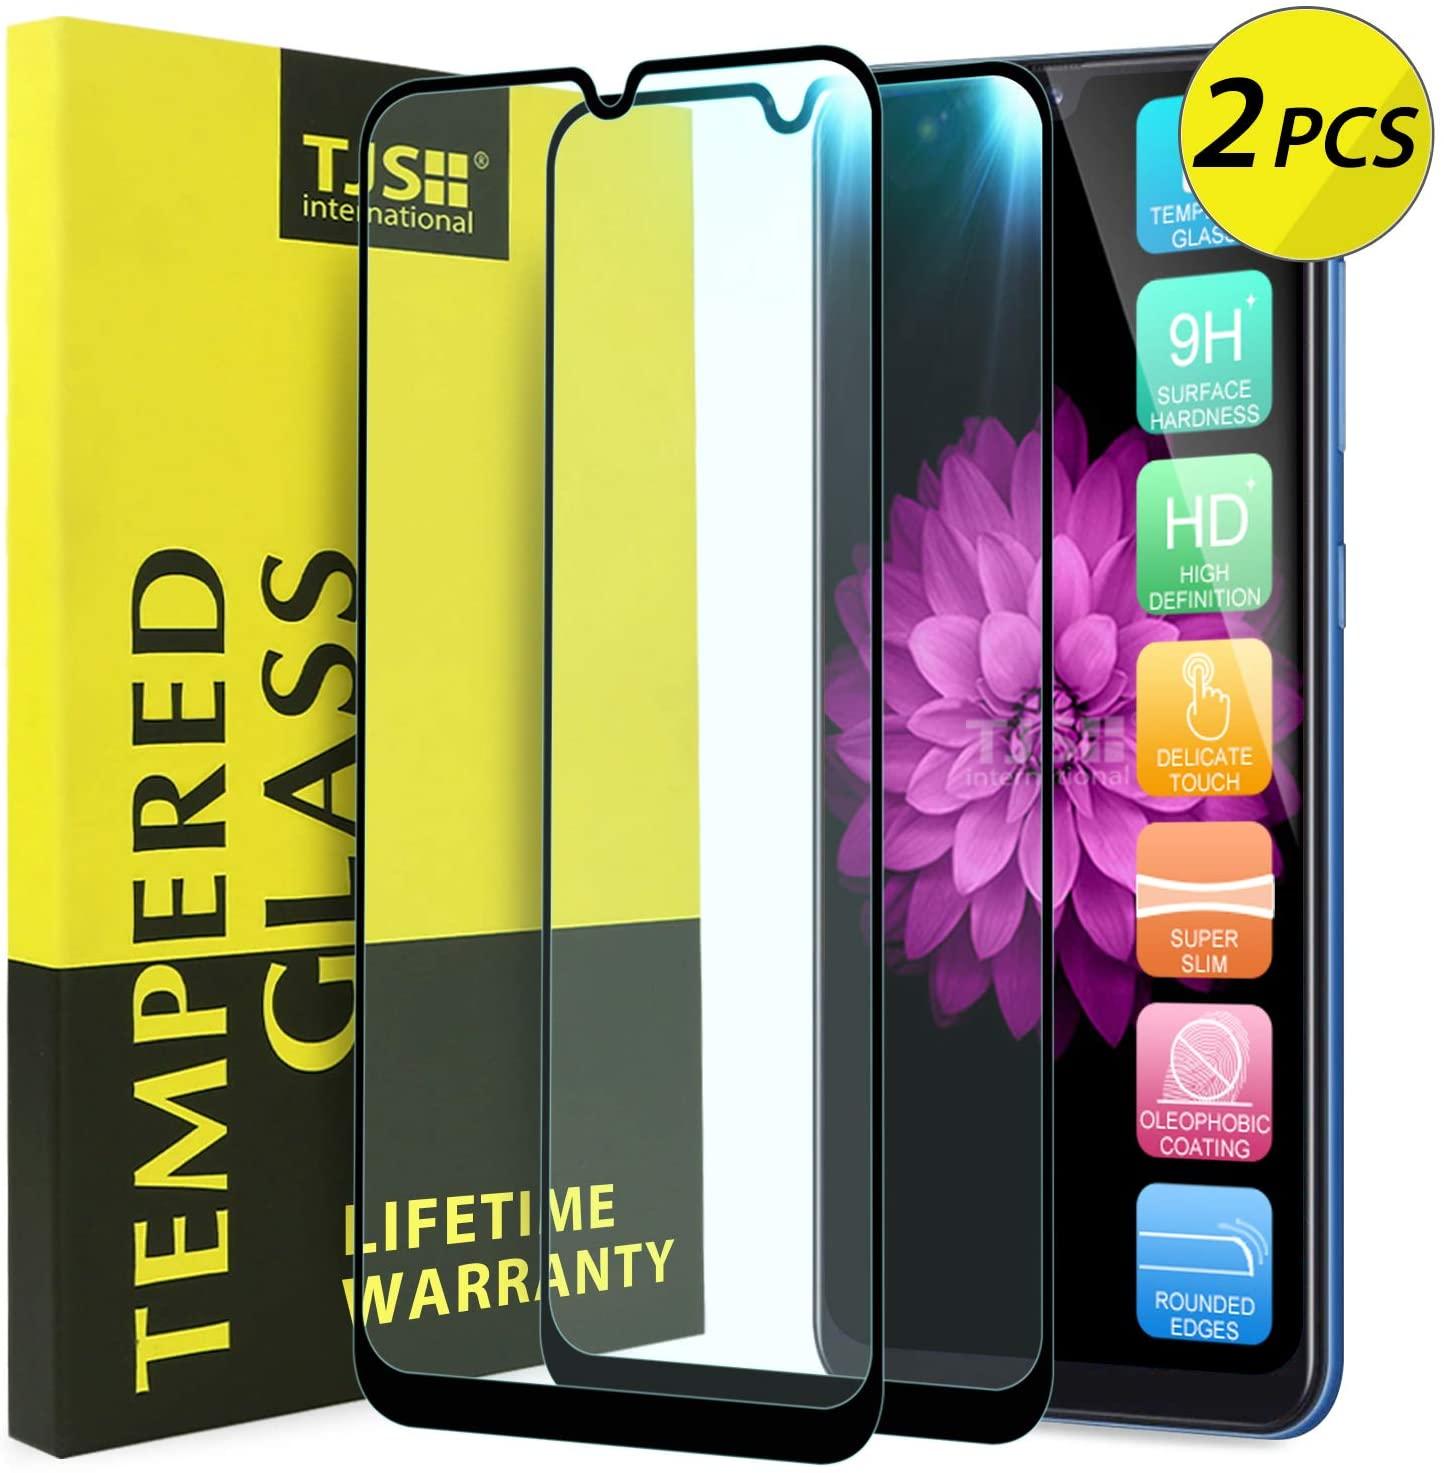 [2-Pack] TJS Screen Protector for Samsung Galaxy A50/Galaxy A30/Galaxy A20 [Full Screen Coverage][Tempered Glass] Case Friendly, Shatterproof, Bubble Free, Anti-Fingerprint (Black)